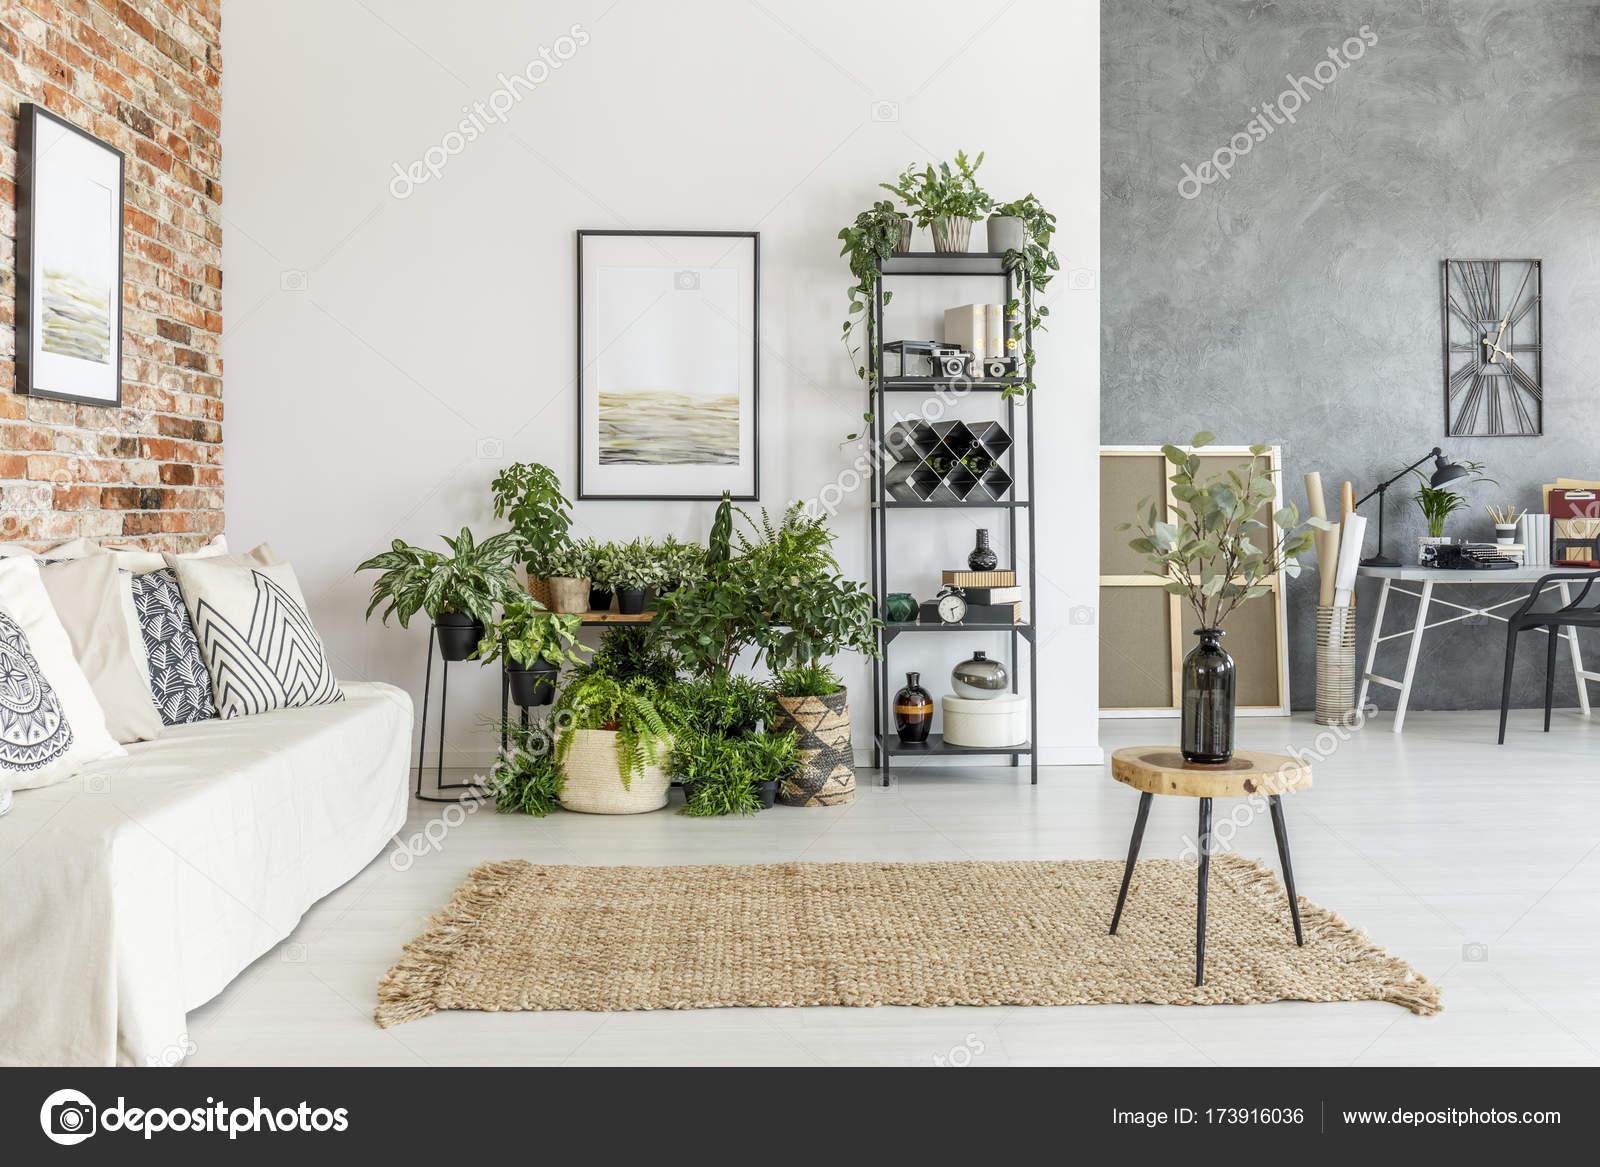 Moderne offene Raum Wohnzimmer — Stockfoto © photographee.eu #173916036